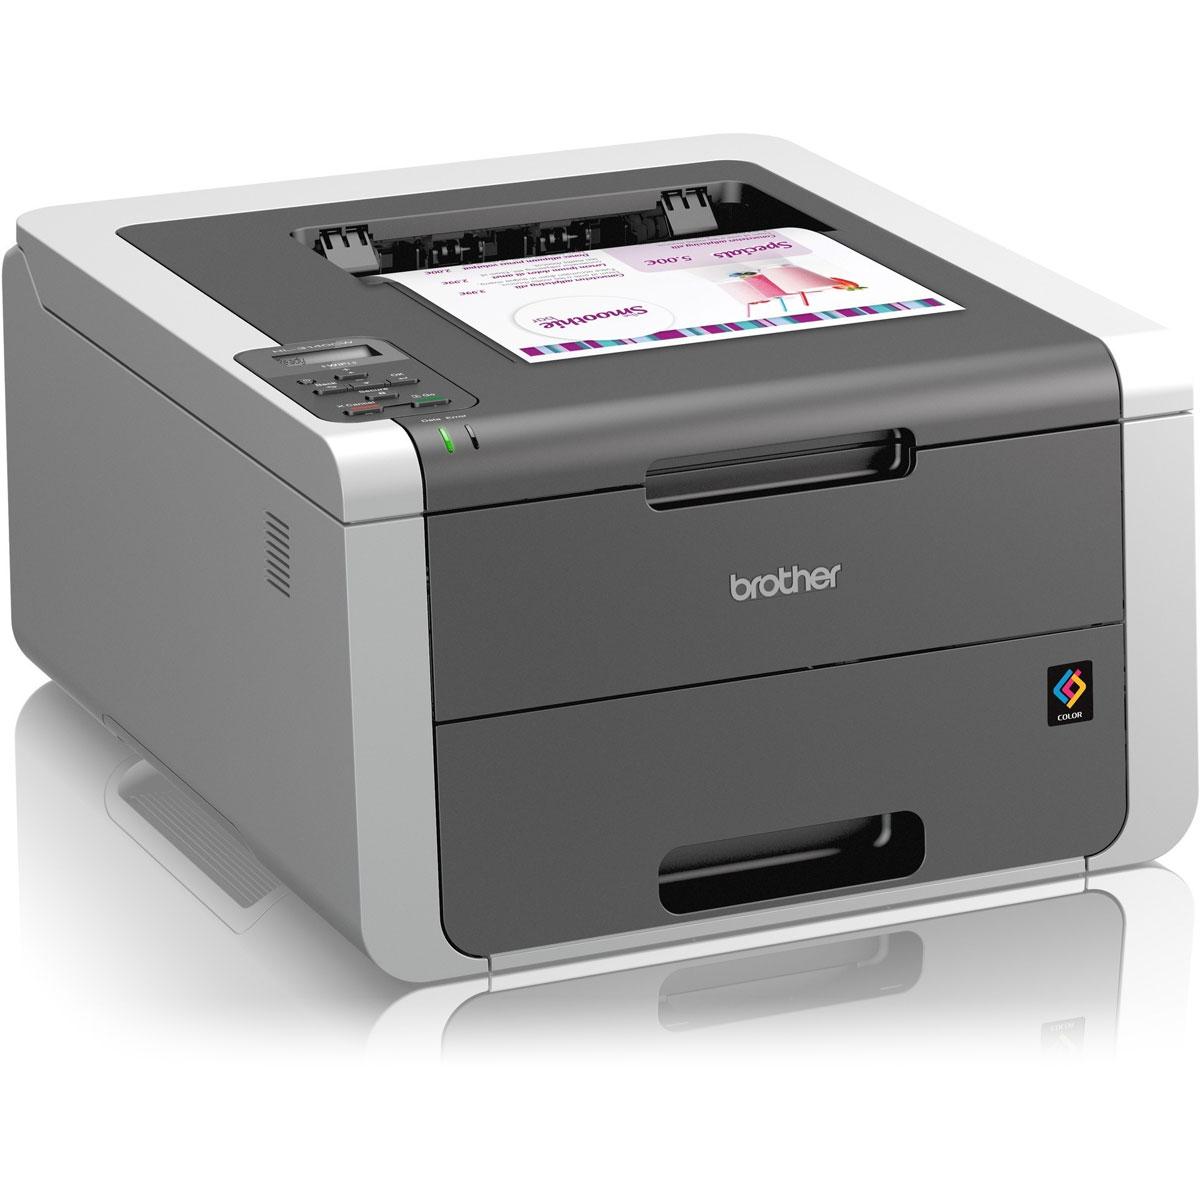 brother imprimante laser couleur